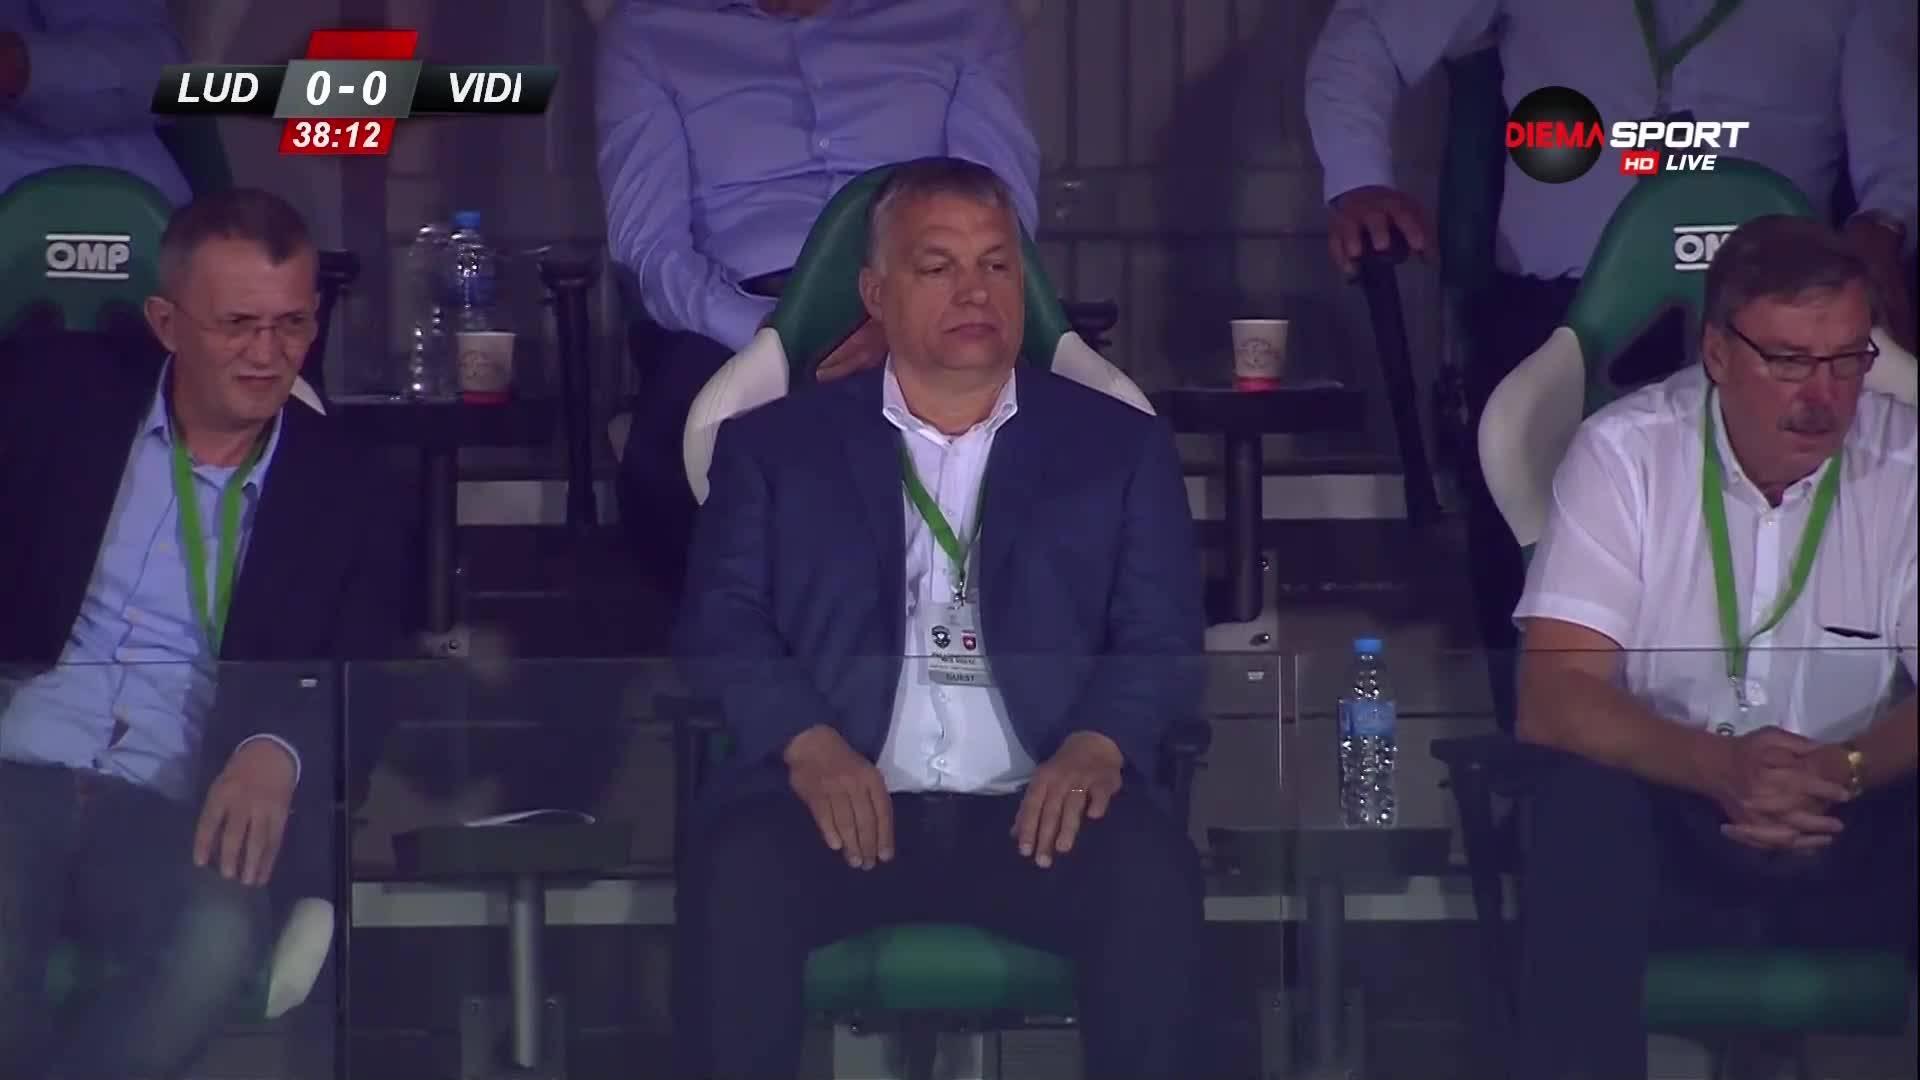 Виктор Орбан наблюдава двубоя между Лудогорец и Видеотон